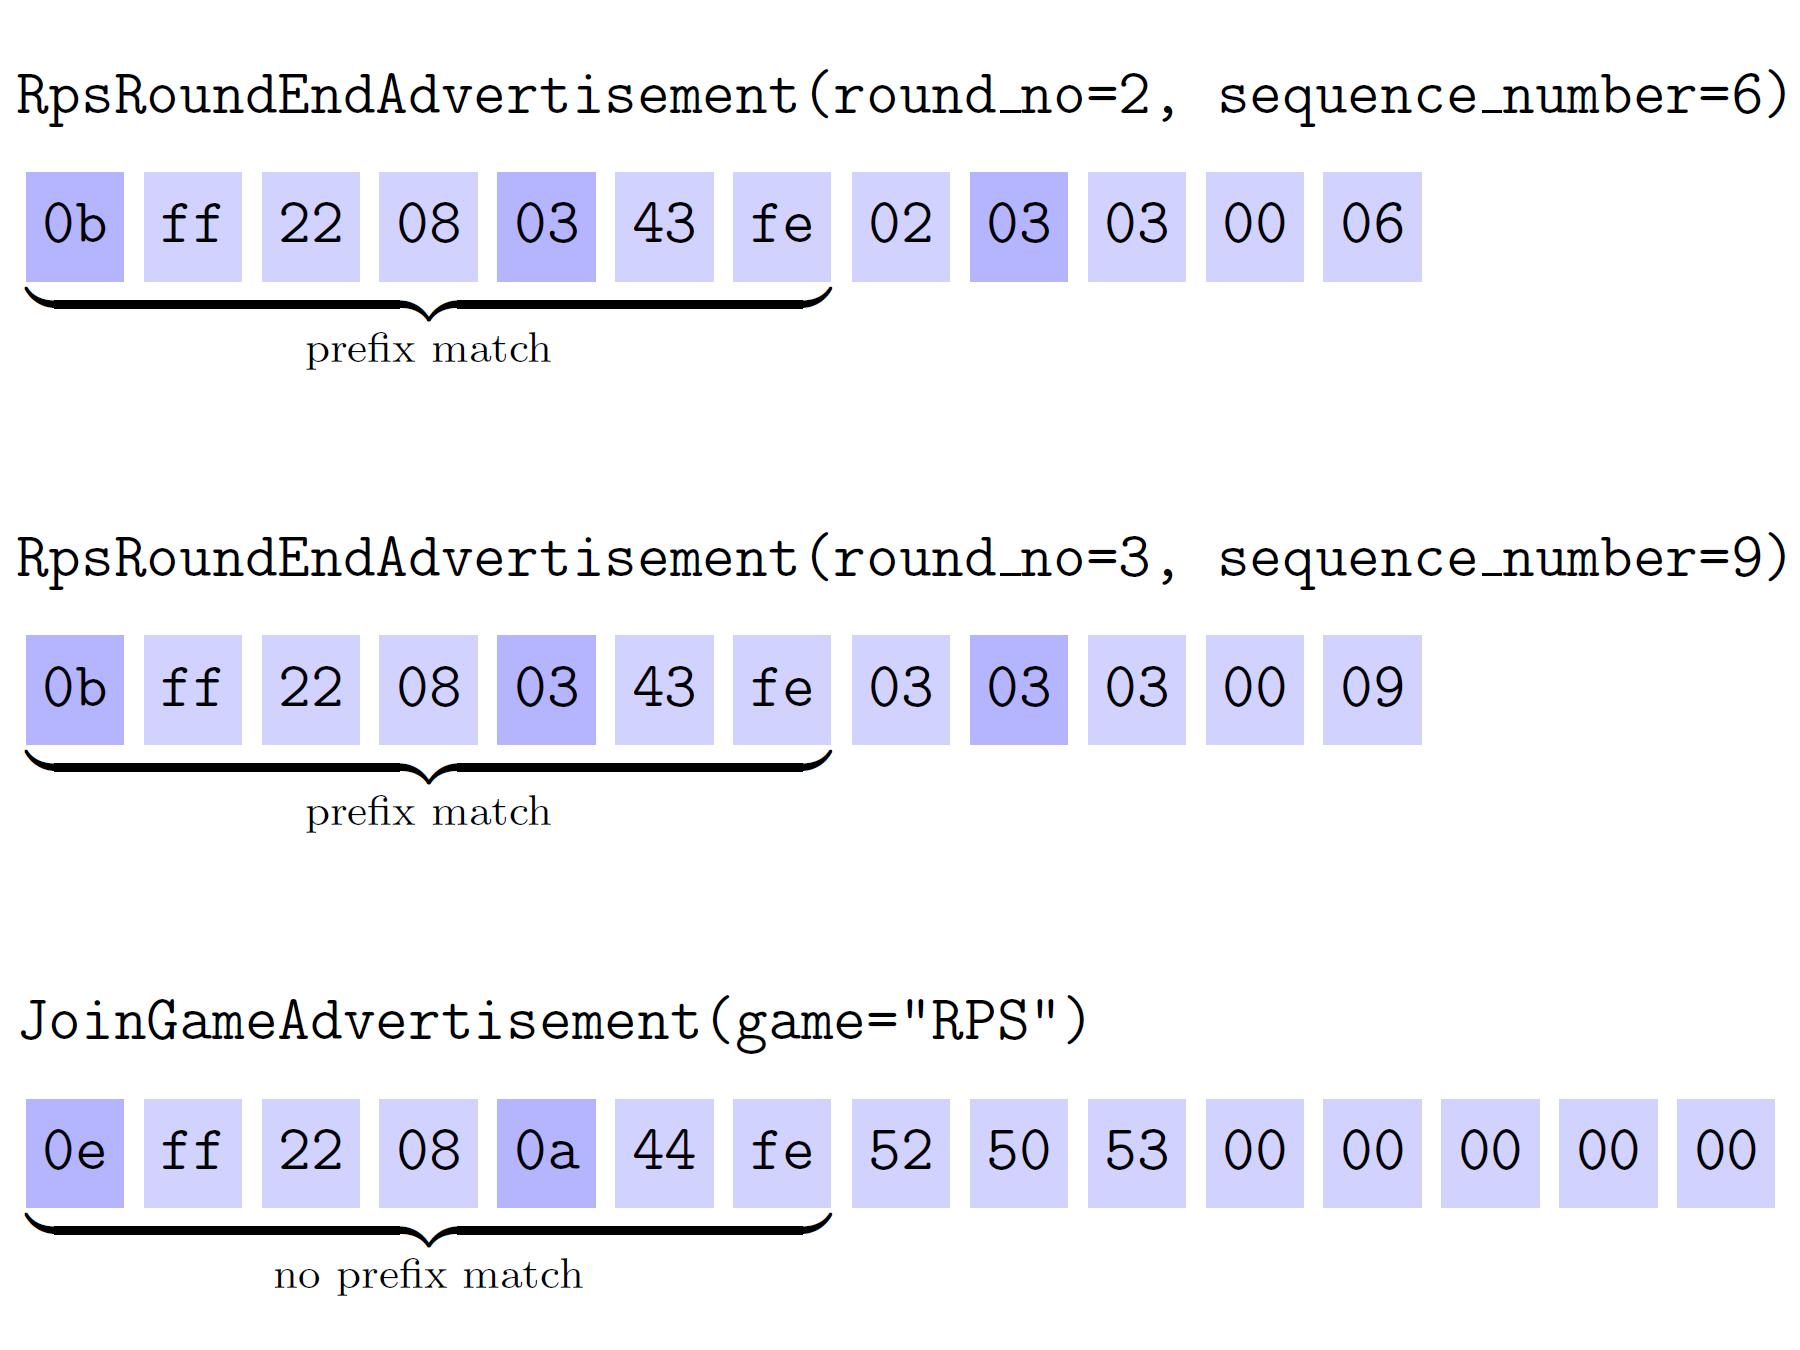 circuitpython_advertisement-prefix-matching-example1-1800x1350.png